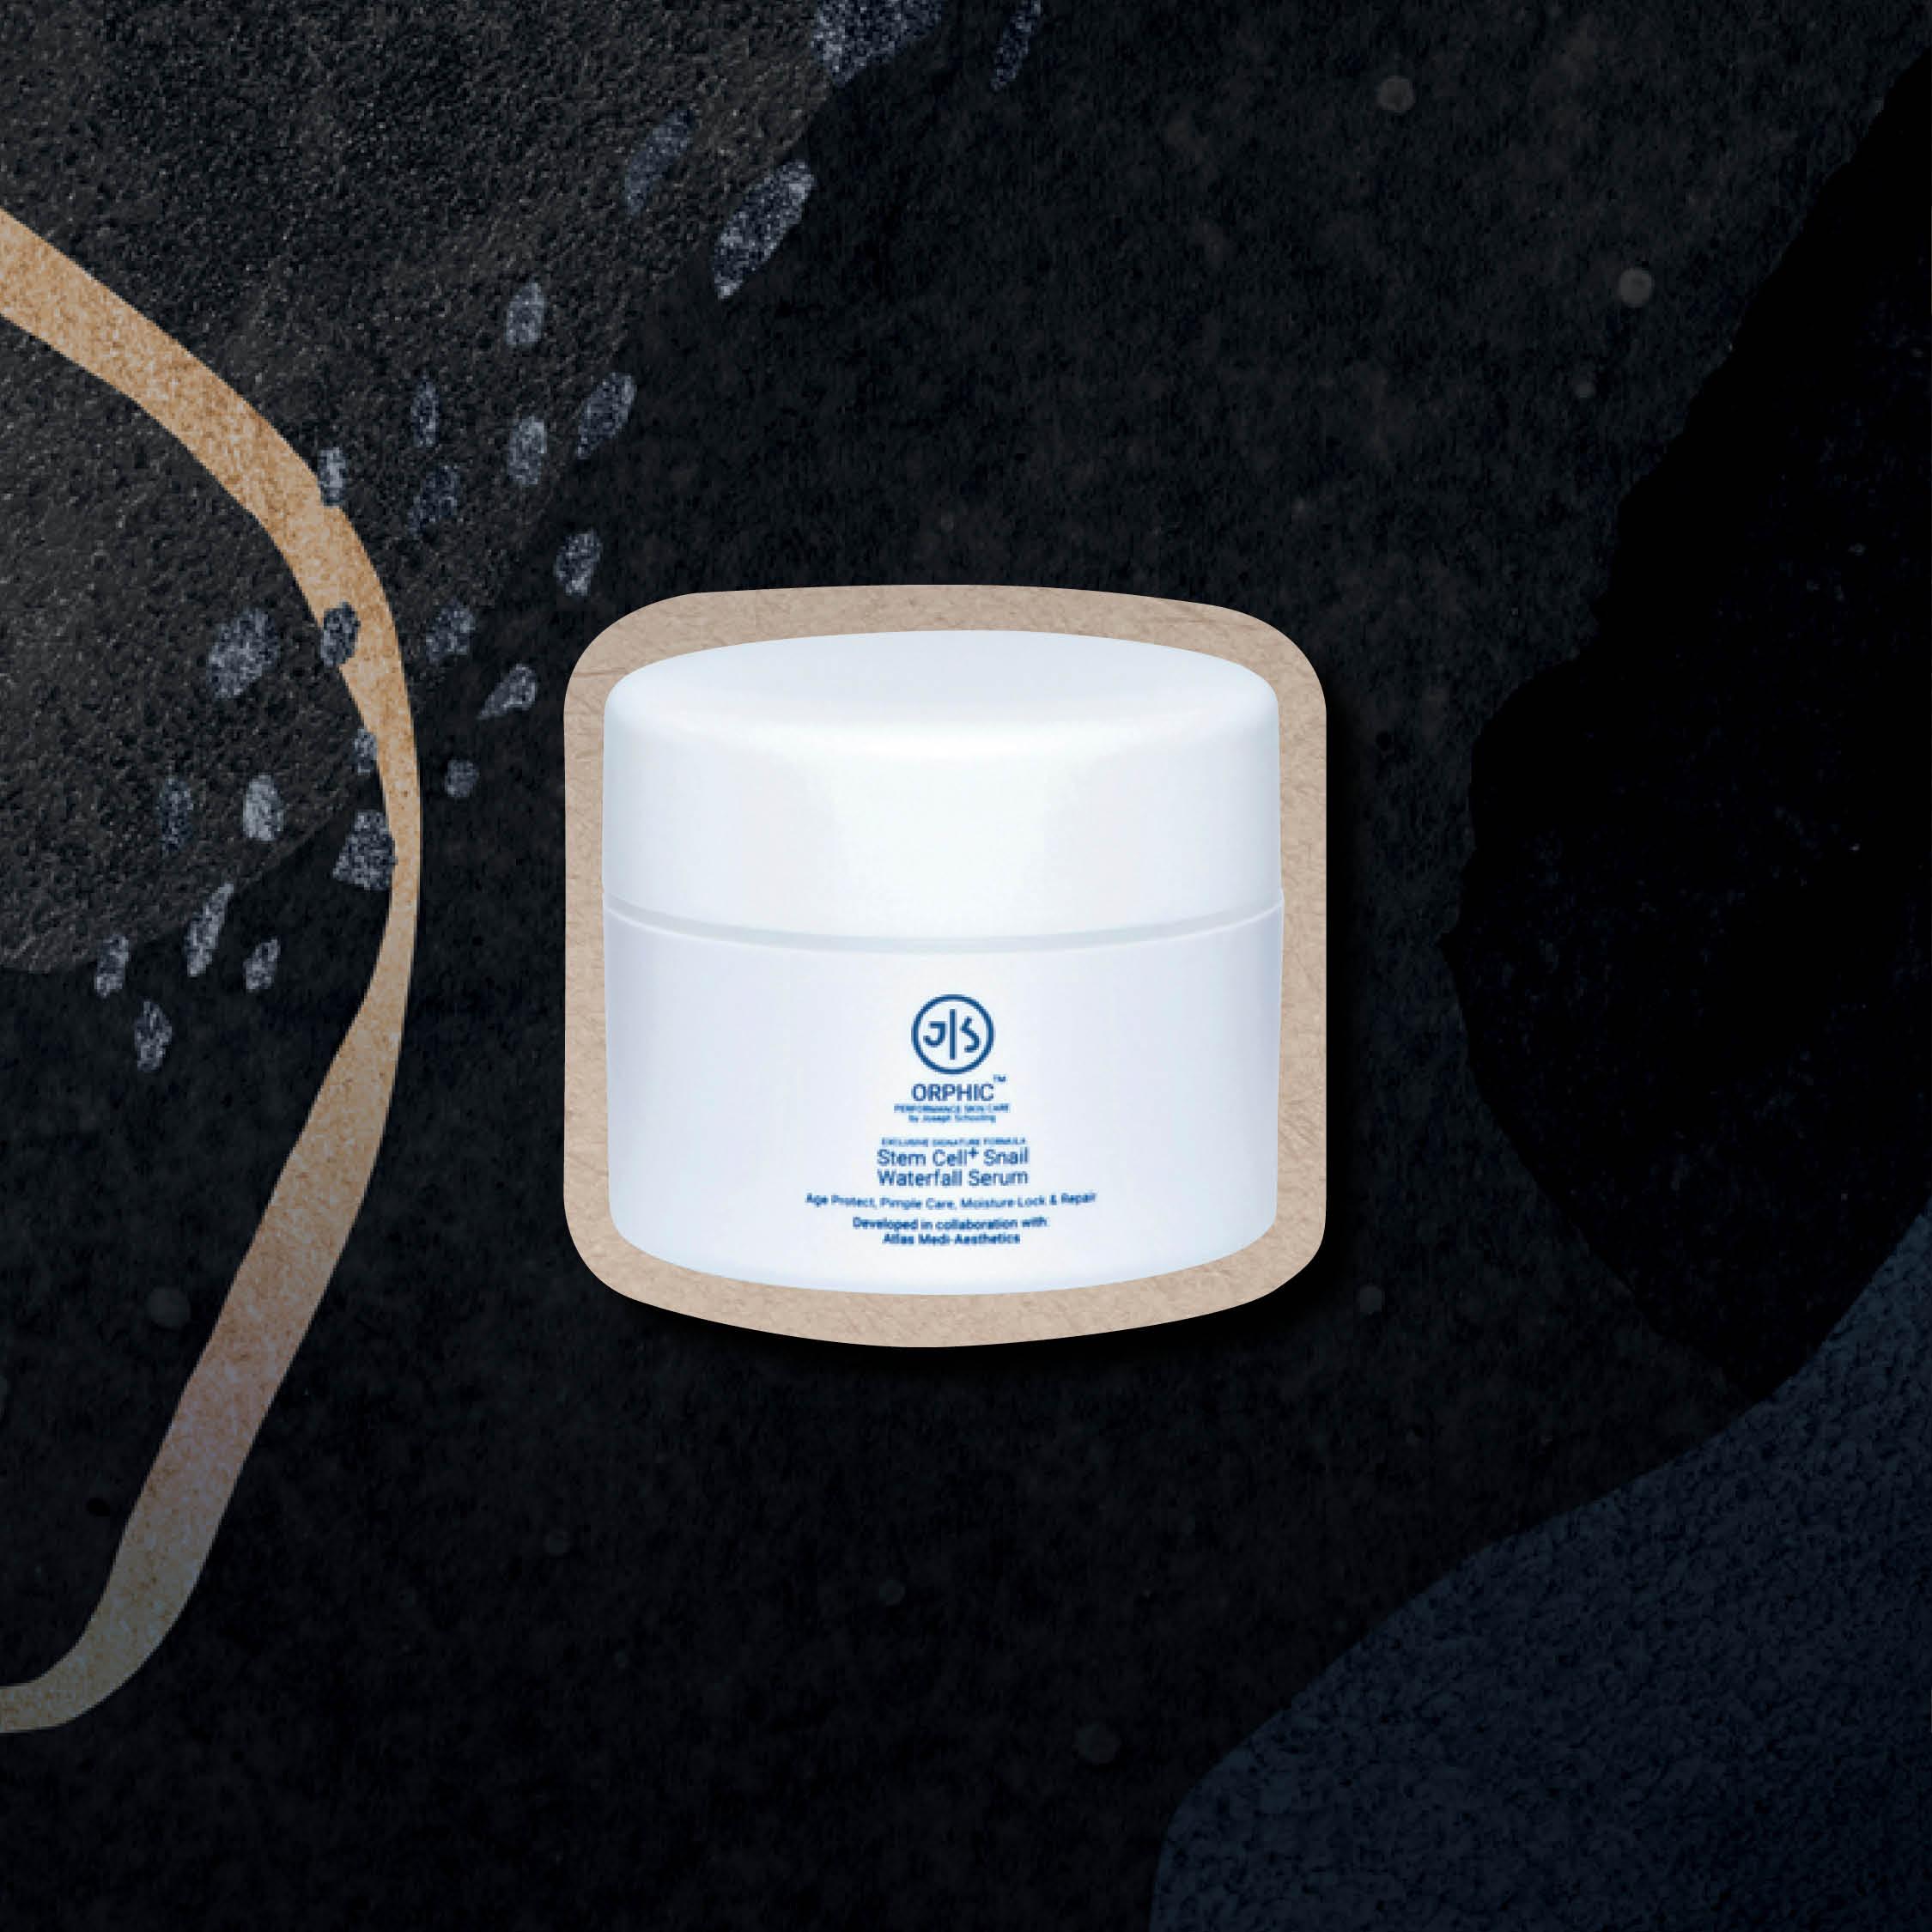 Grooming Awards 2020 - Best Serum for Mature Skin. Art Direction: Jonathan Tai